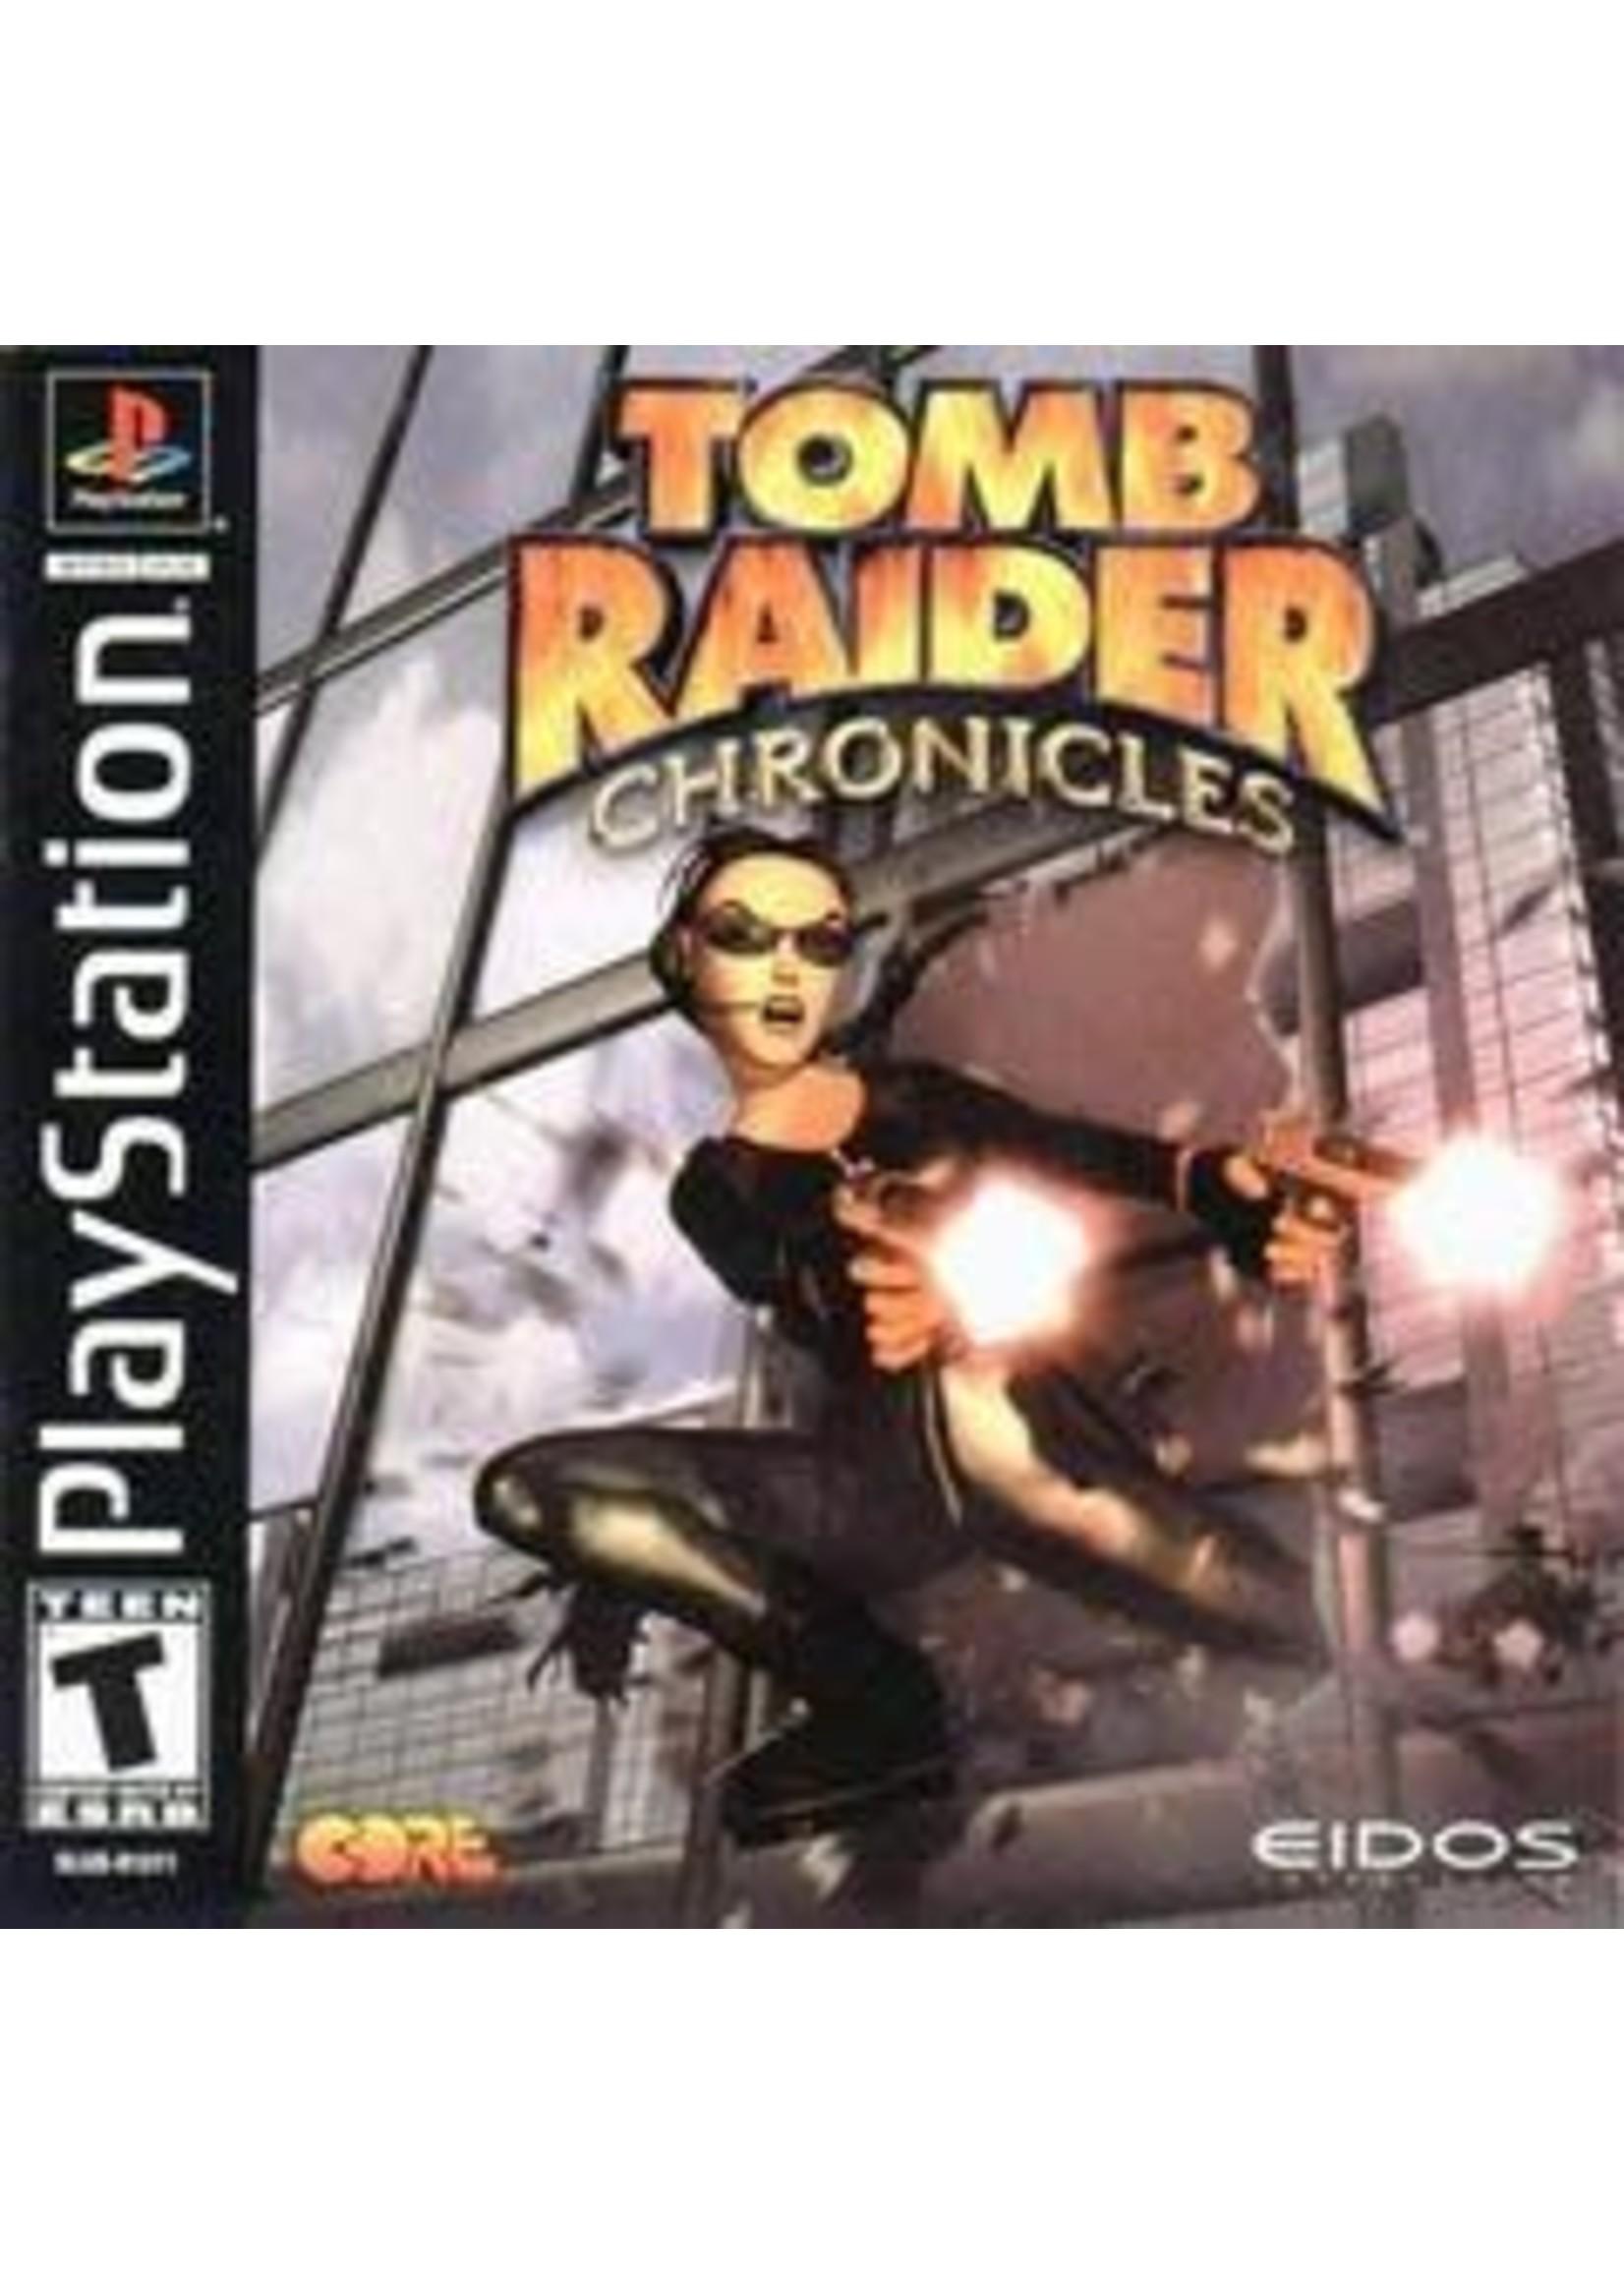 Tomb Raider Chronicles Playstation